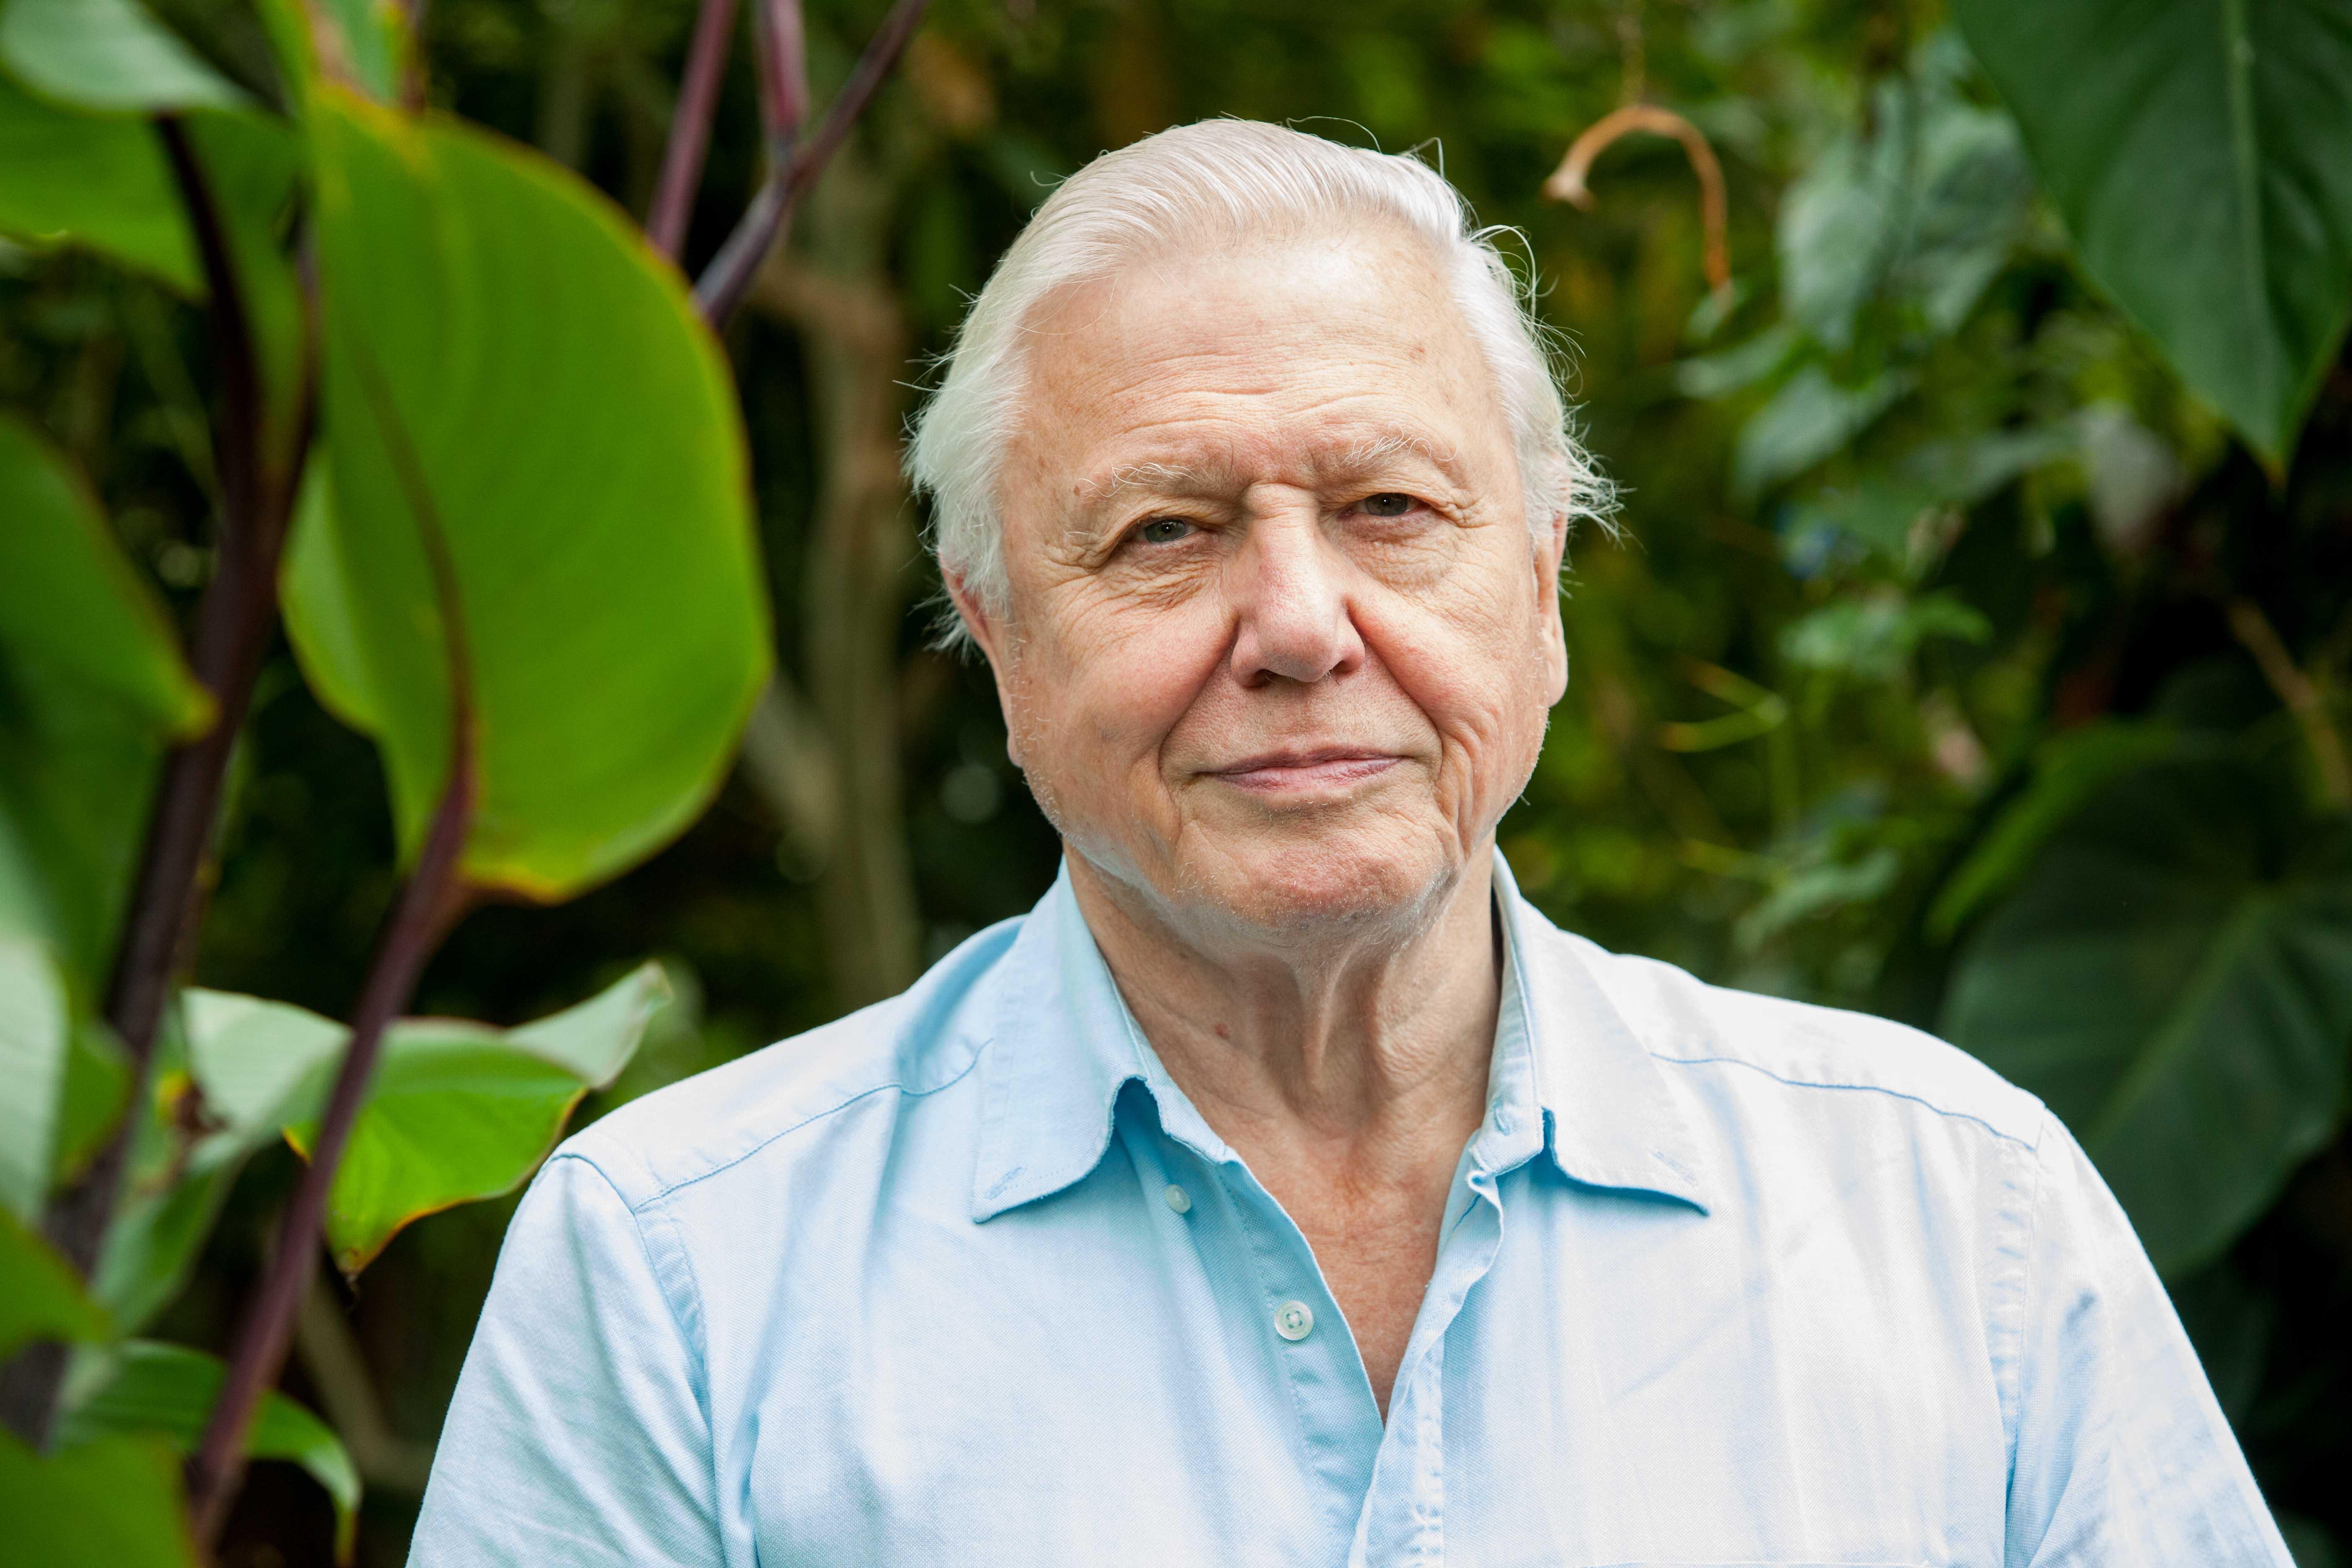 david attenborough - photo #13